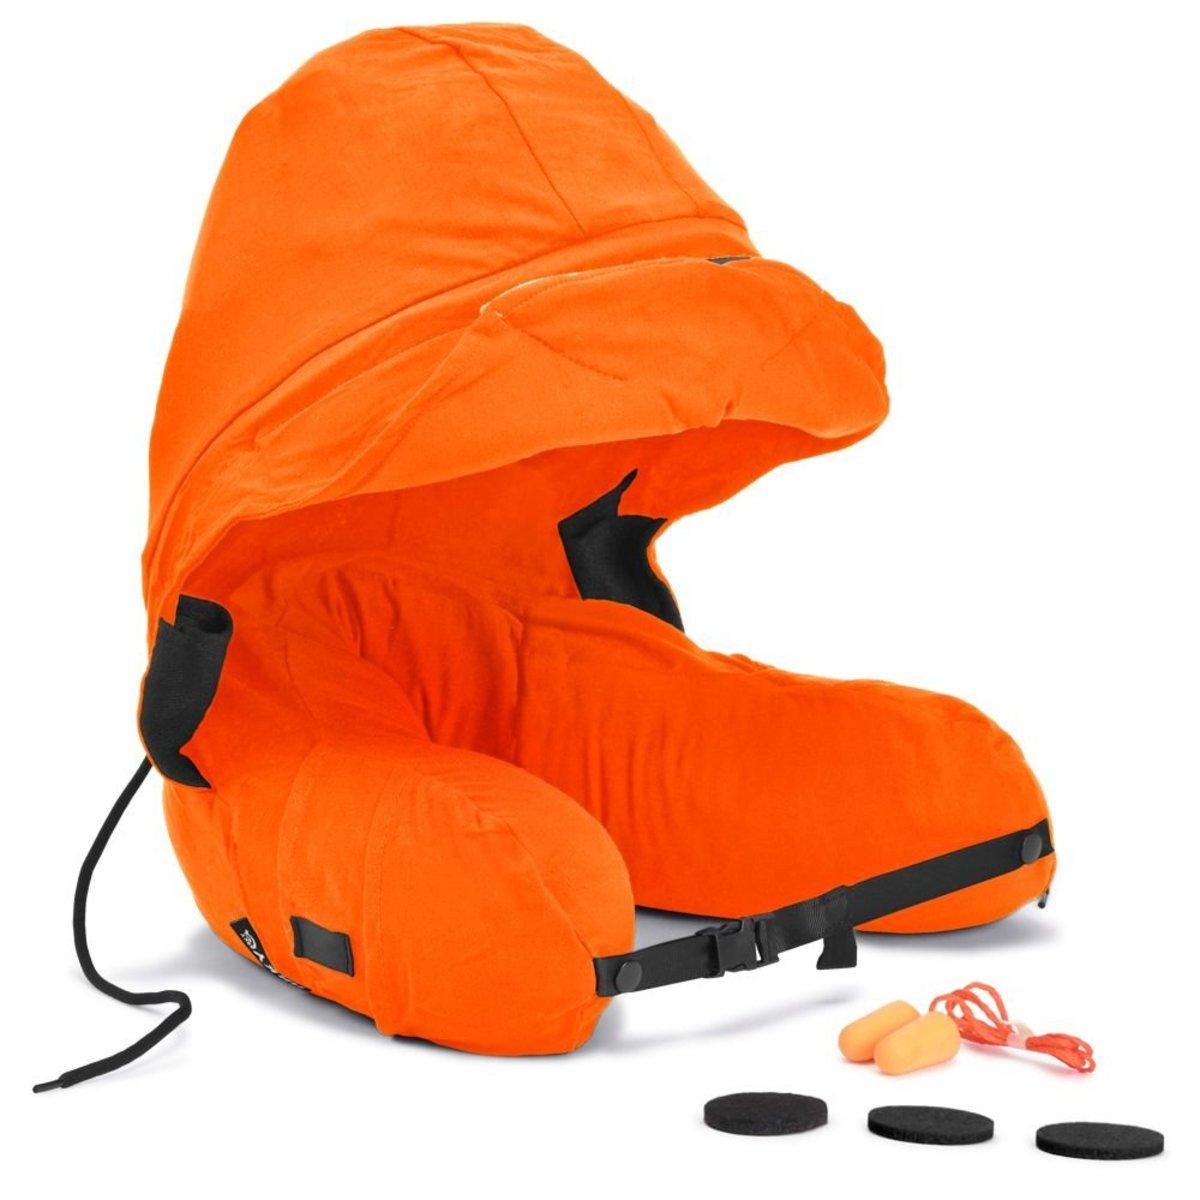 Somnus Travel Pillow ( Quick Inflatable Version ) - Orange